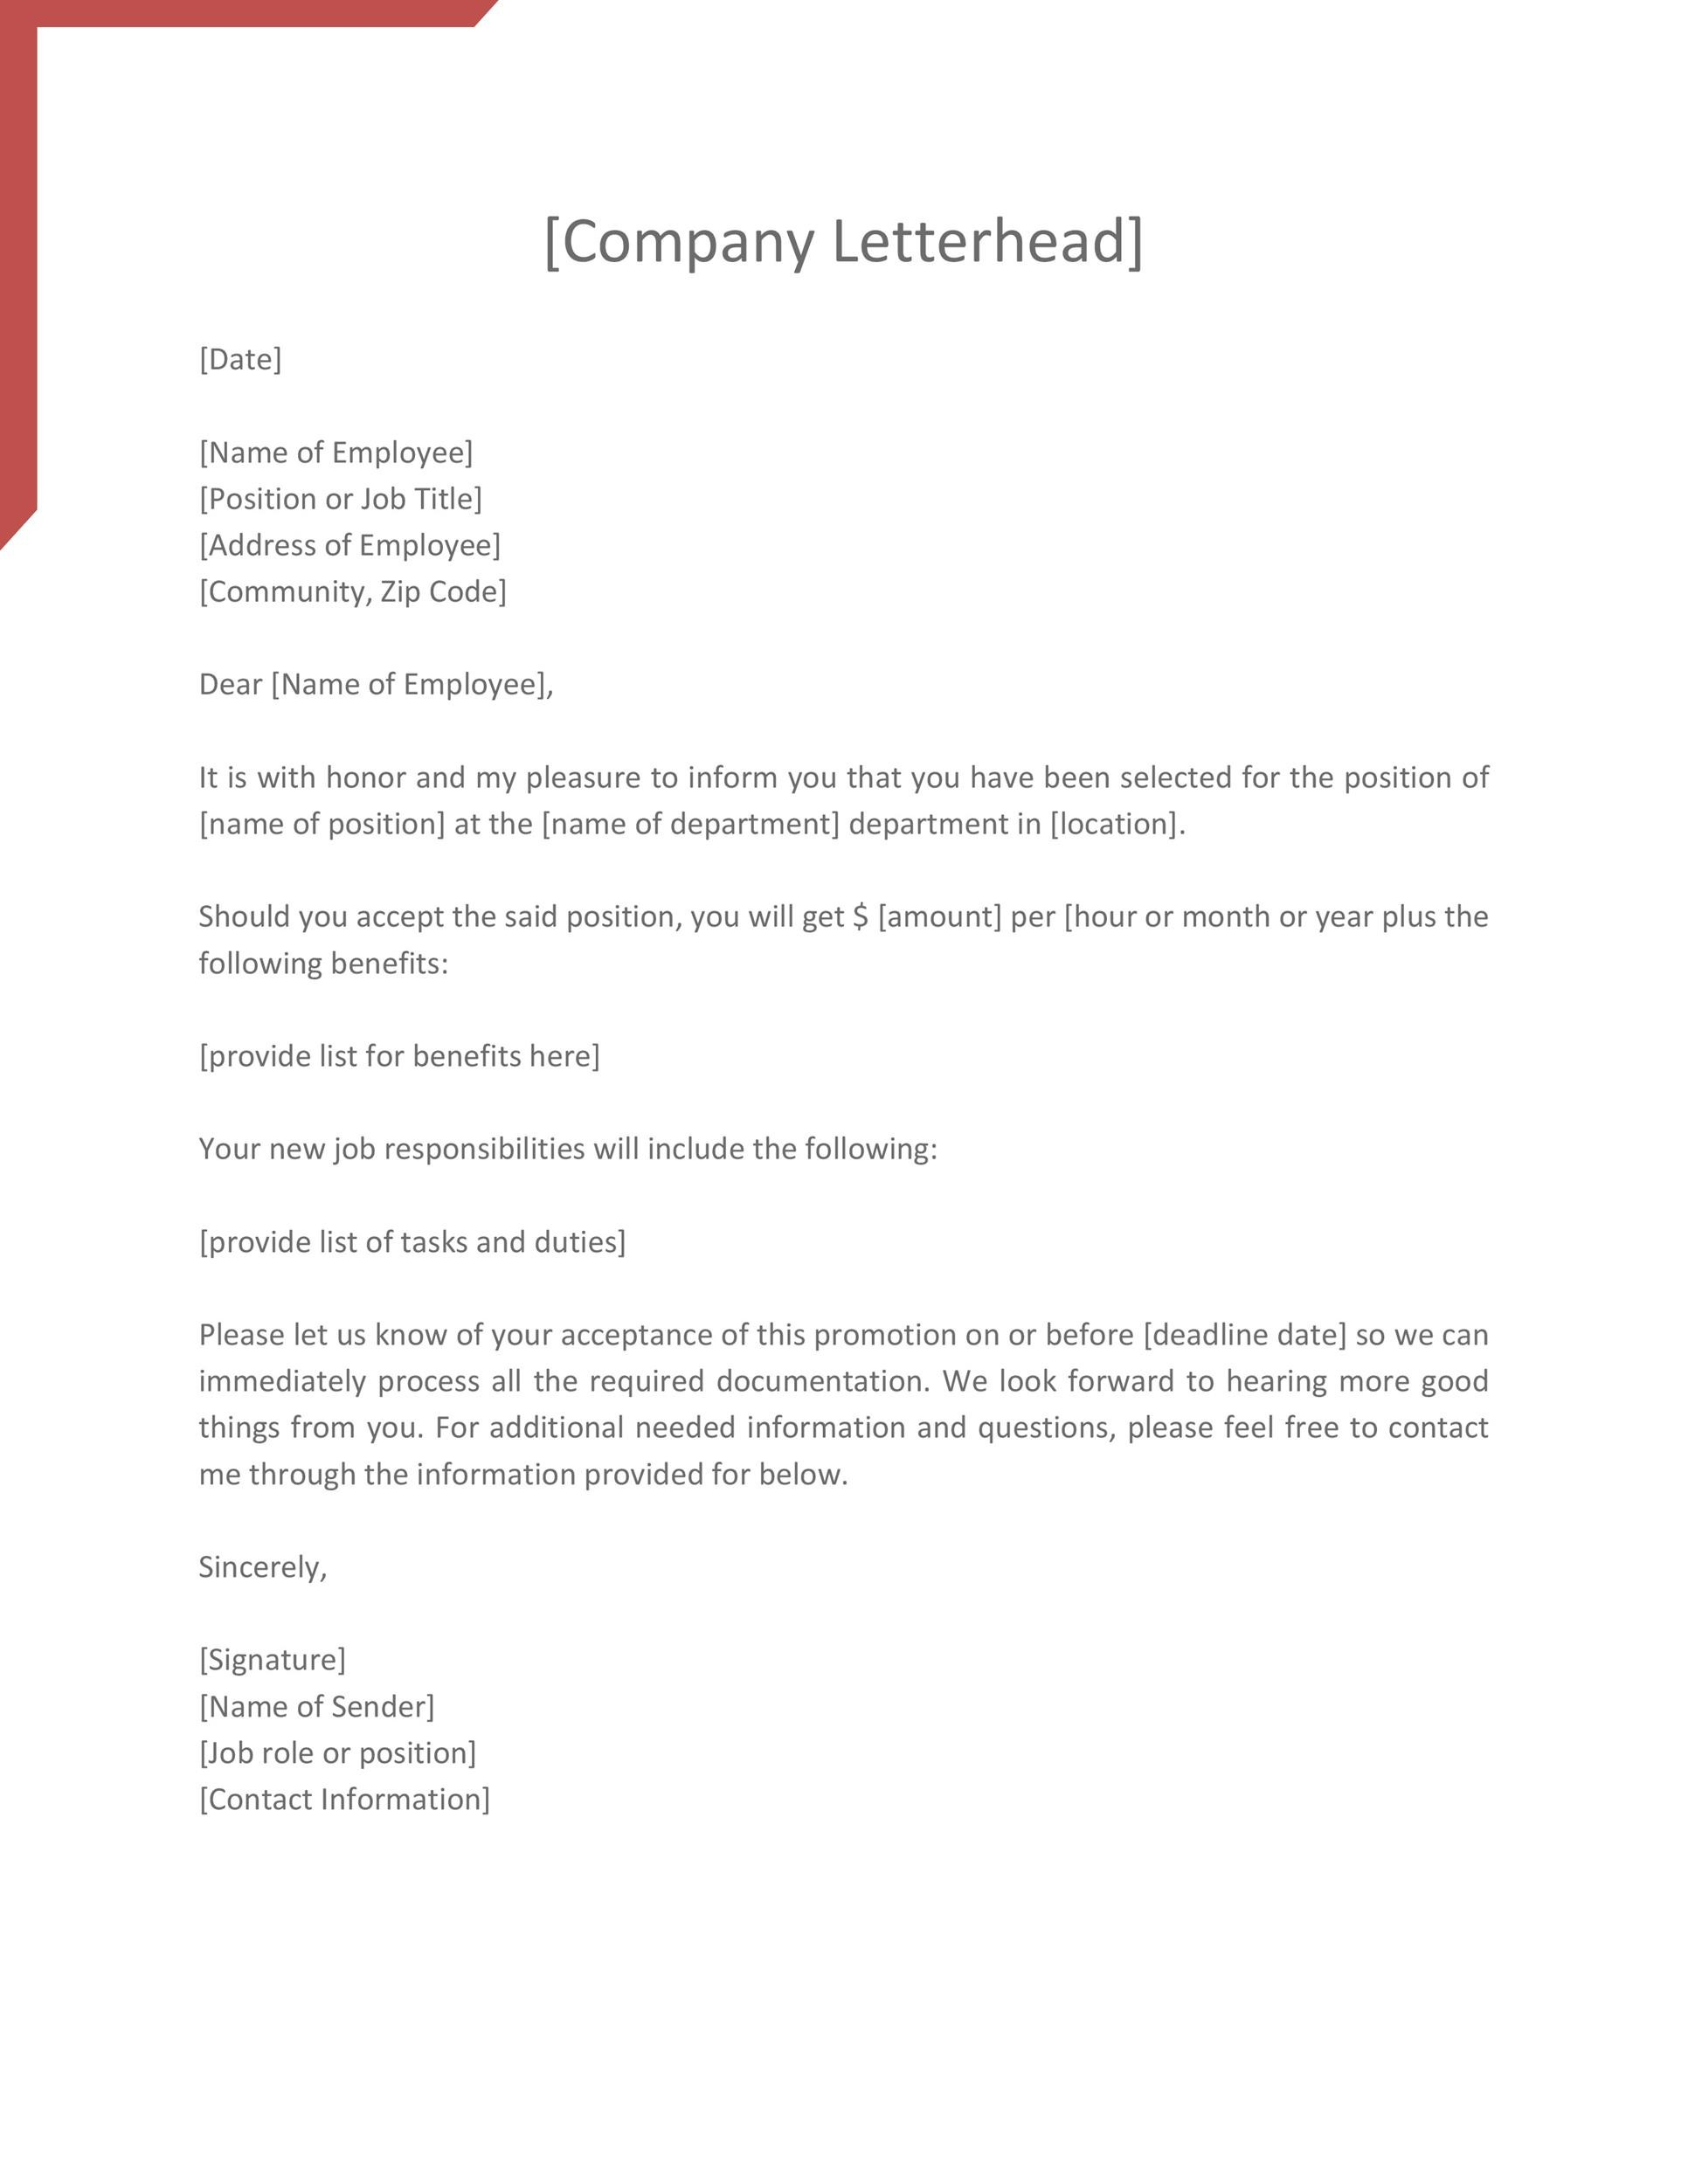 Free promotion letter 25